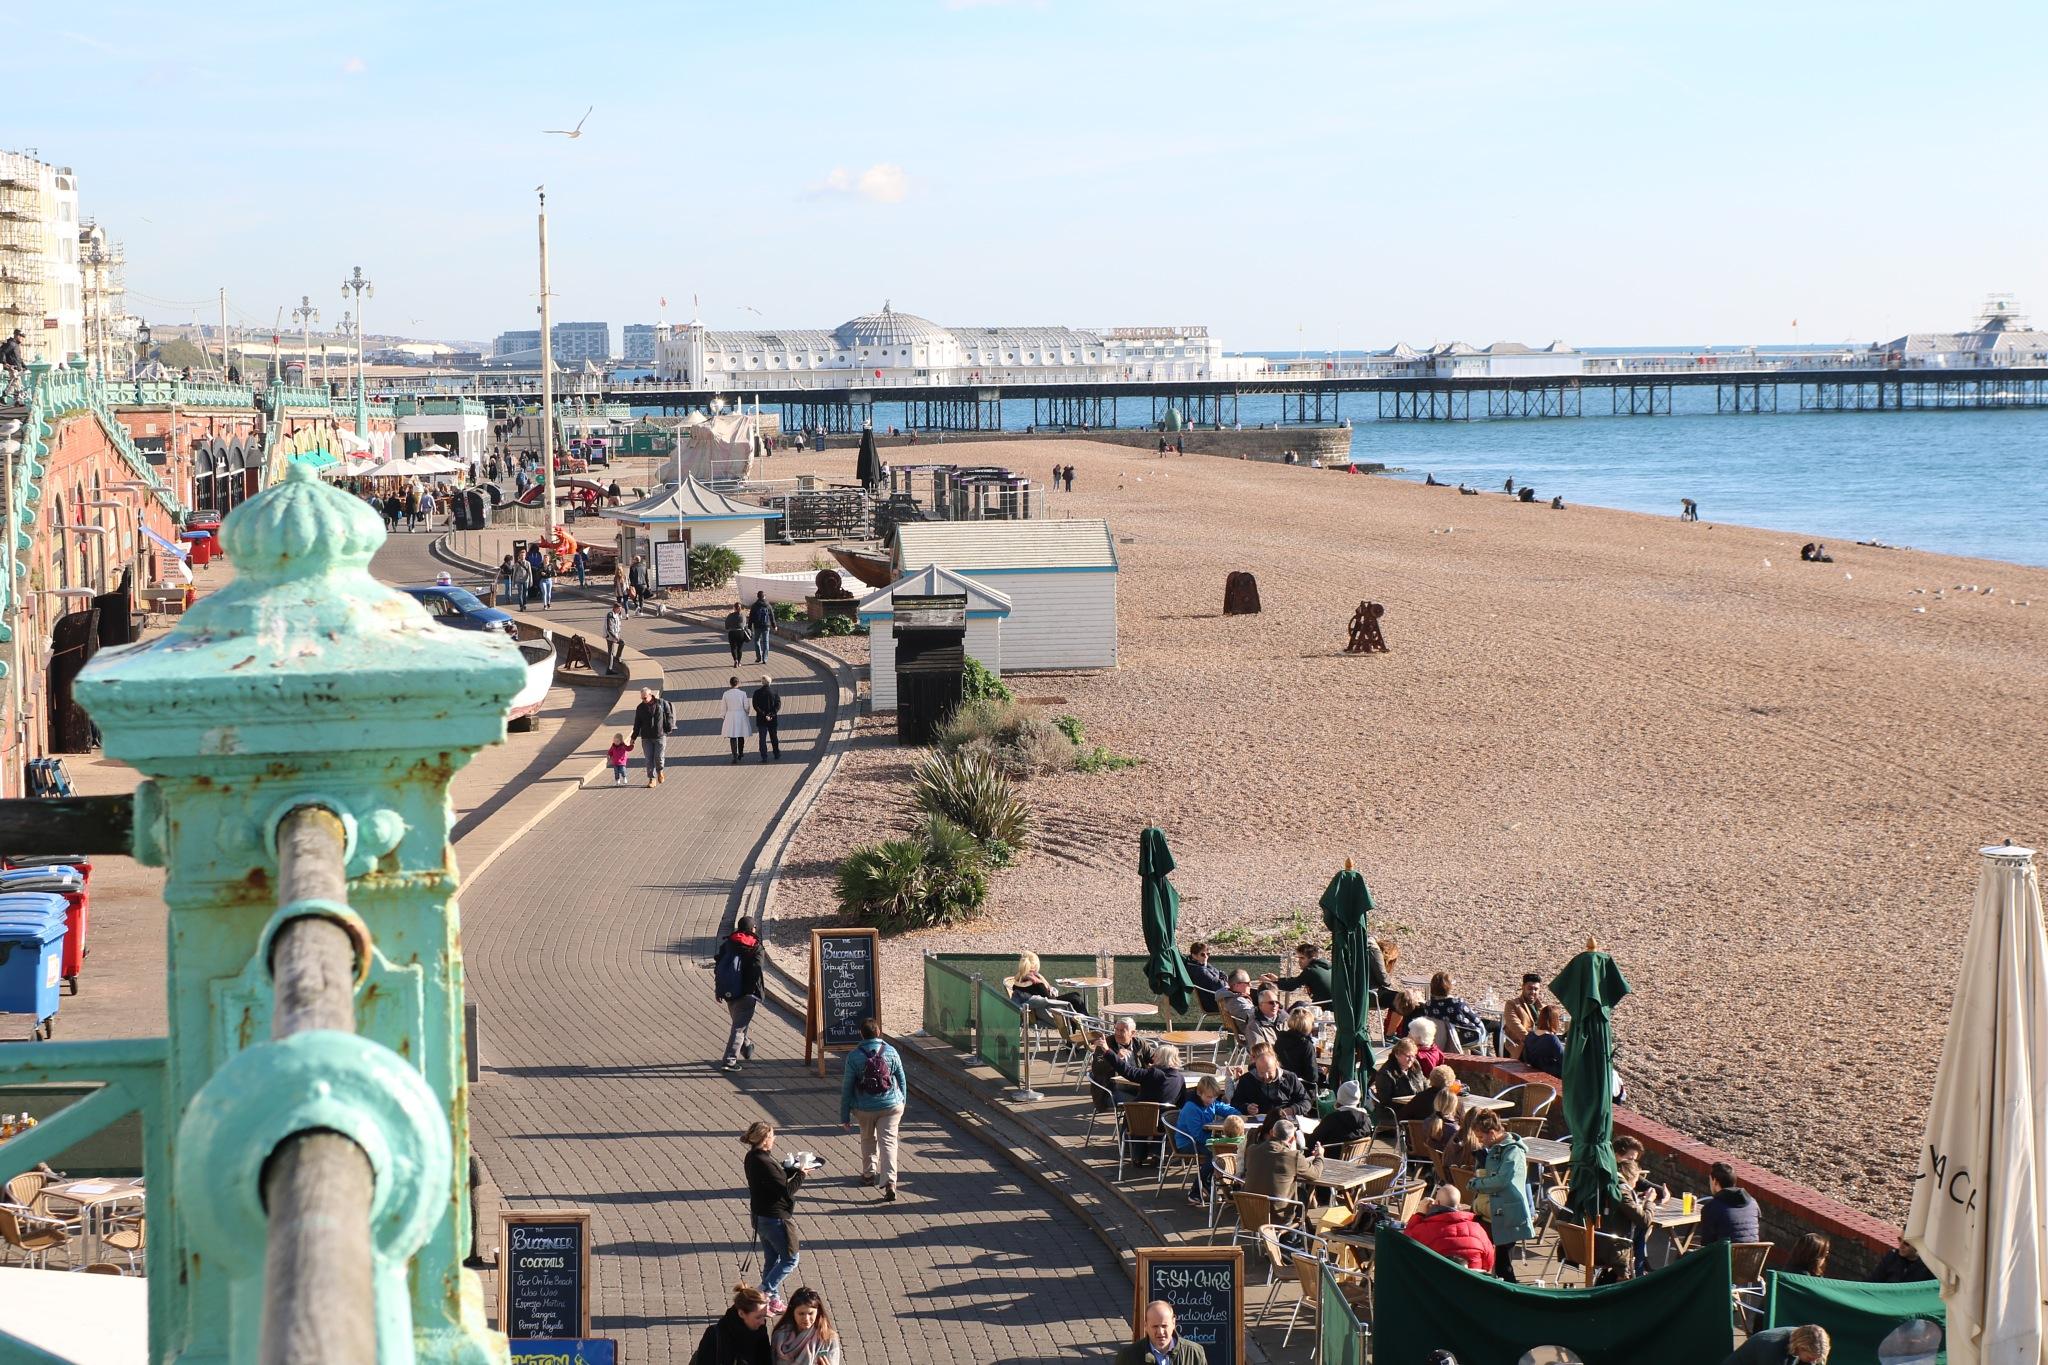 Brighton Pier & seafront by Mo Dessouki